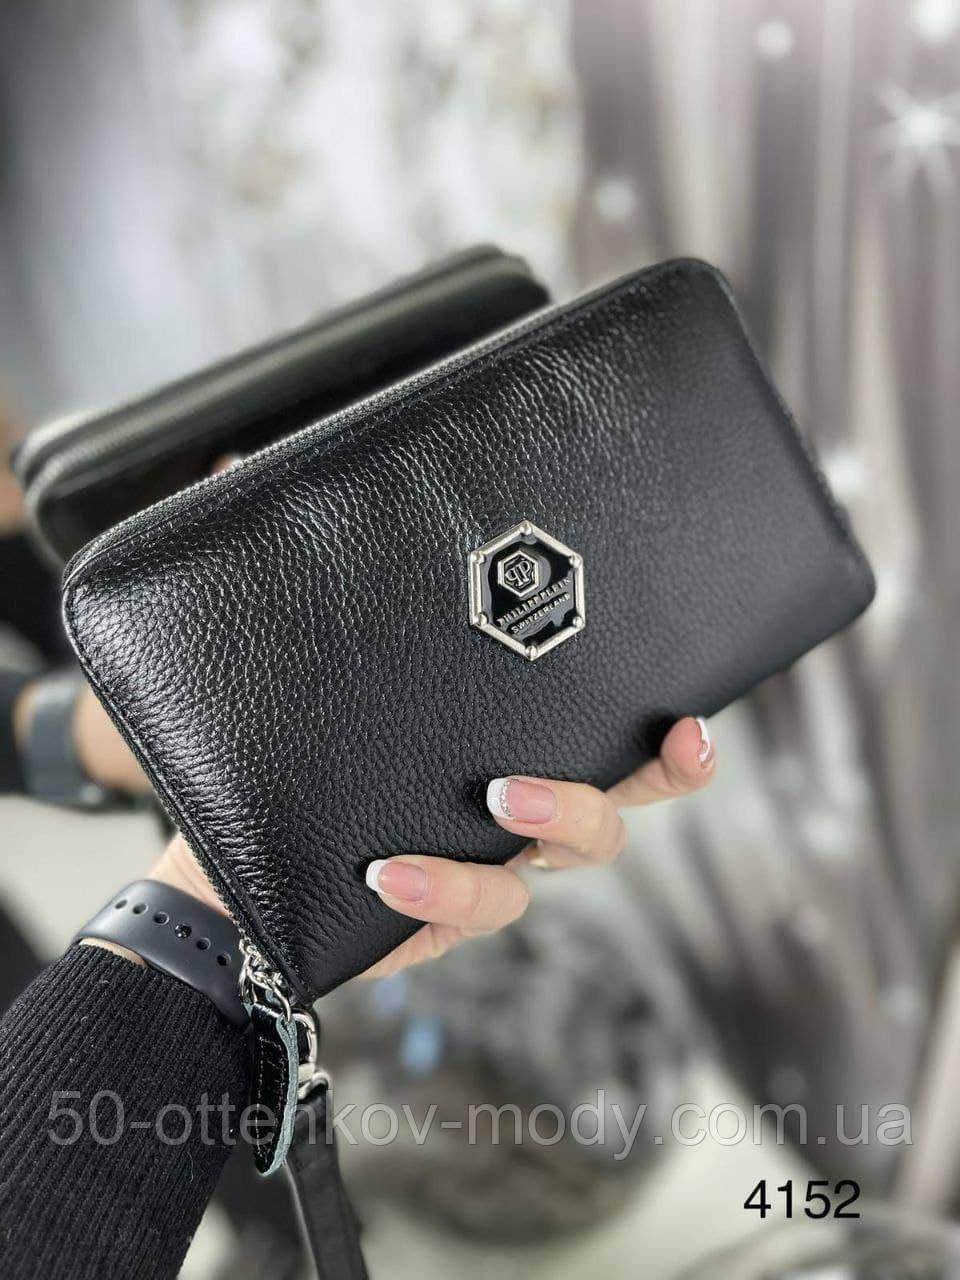 Мужской кошелек-барсетка кожаный